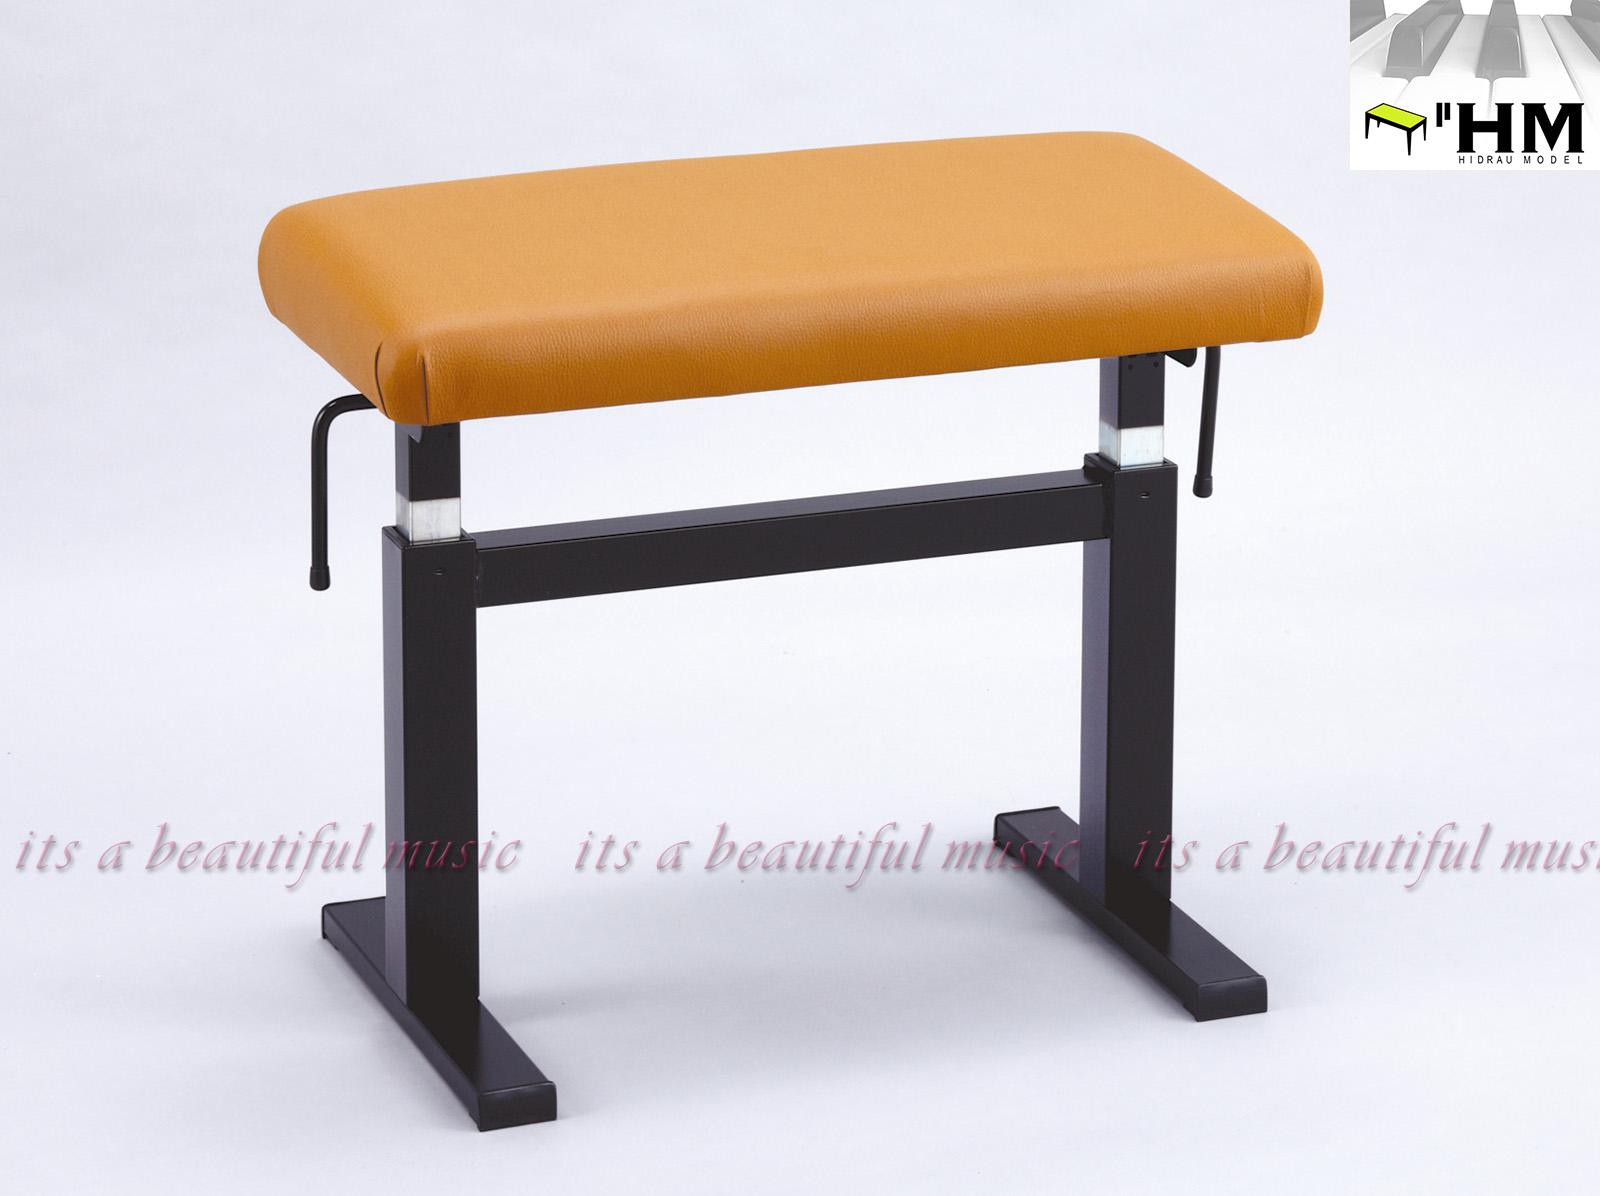 【its】スペイン/HIDRAU社 ガススプリング式高級輸入ピアノ椅子 BM-44H(ブラウン座面)